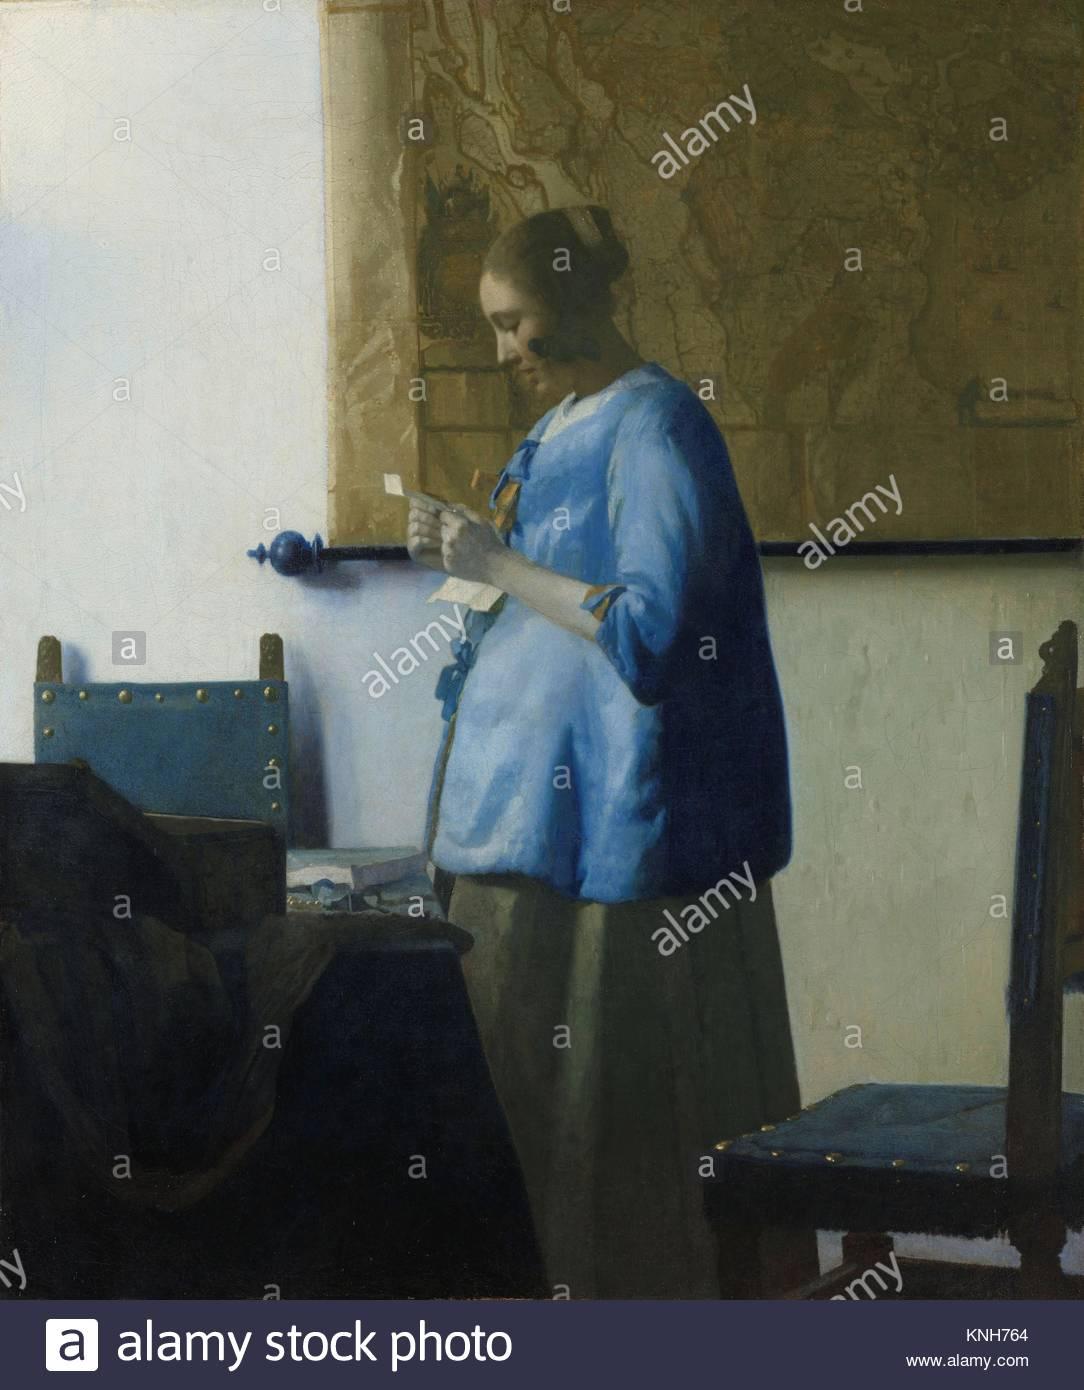 Woman Reading a Letter Johannes Vermeer, c. 1663, Rijksmuseum, Netherlands, - Stock Image